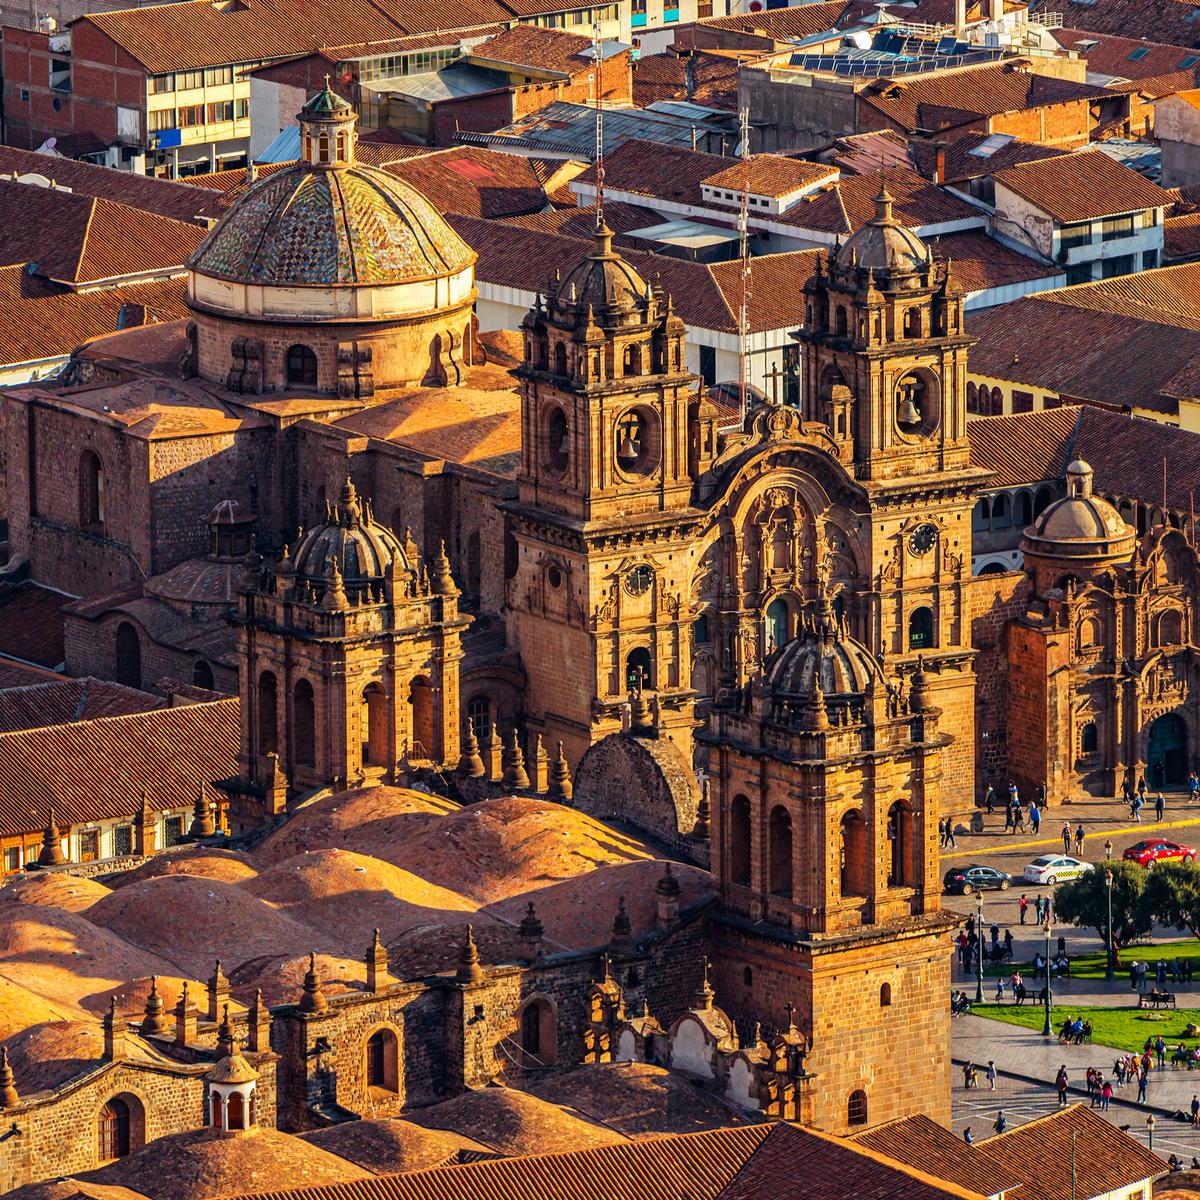 Cusco's (Plaza de Armas). Featuring the Cathedral Basilica and the Church La Compania de Jesus.